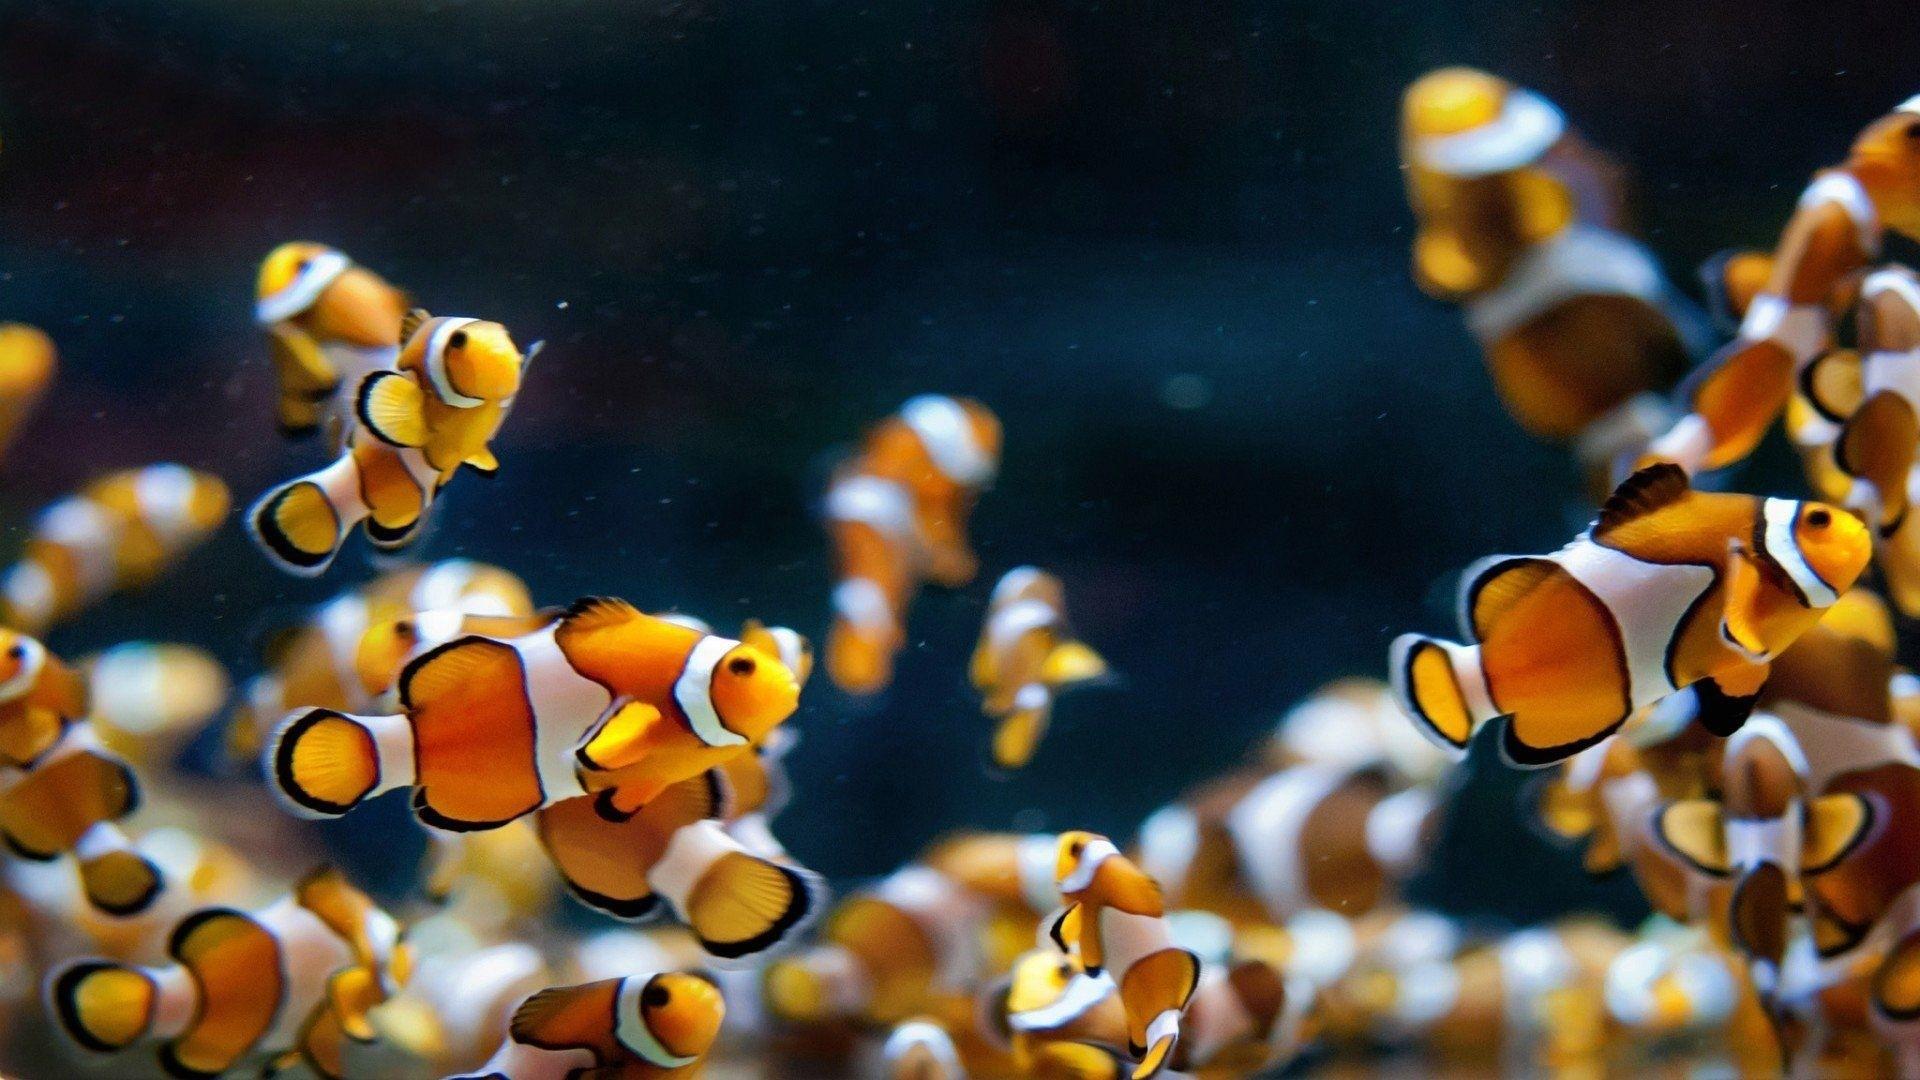 Fish hd desktop wallpaper